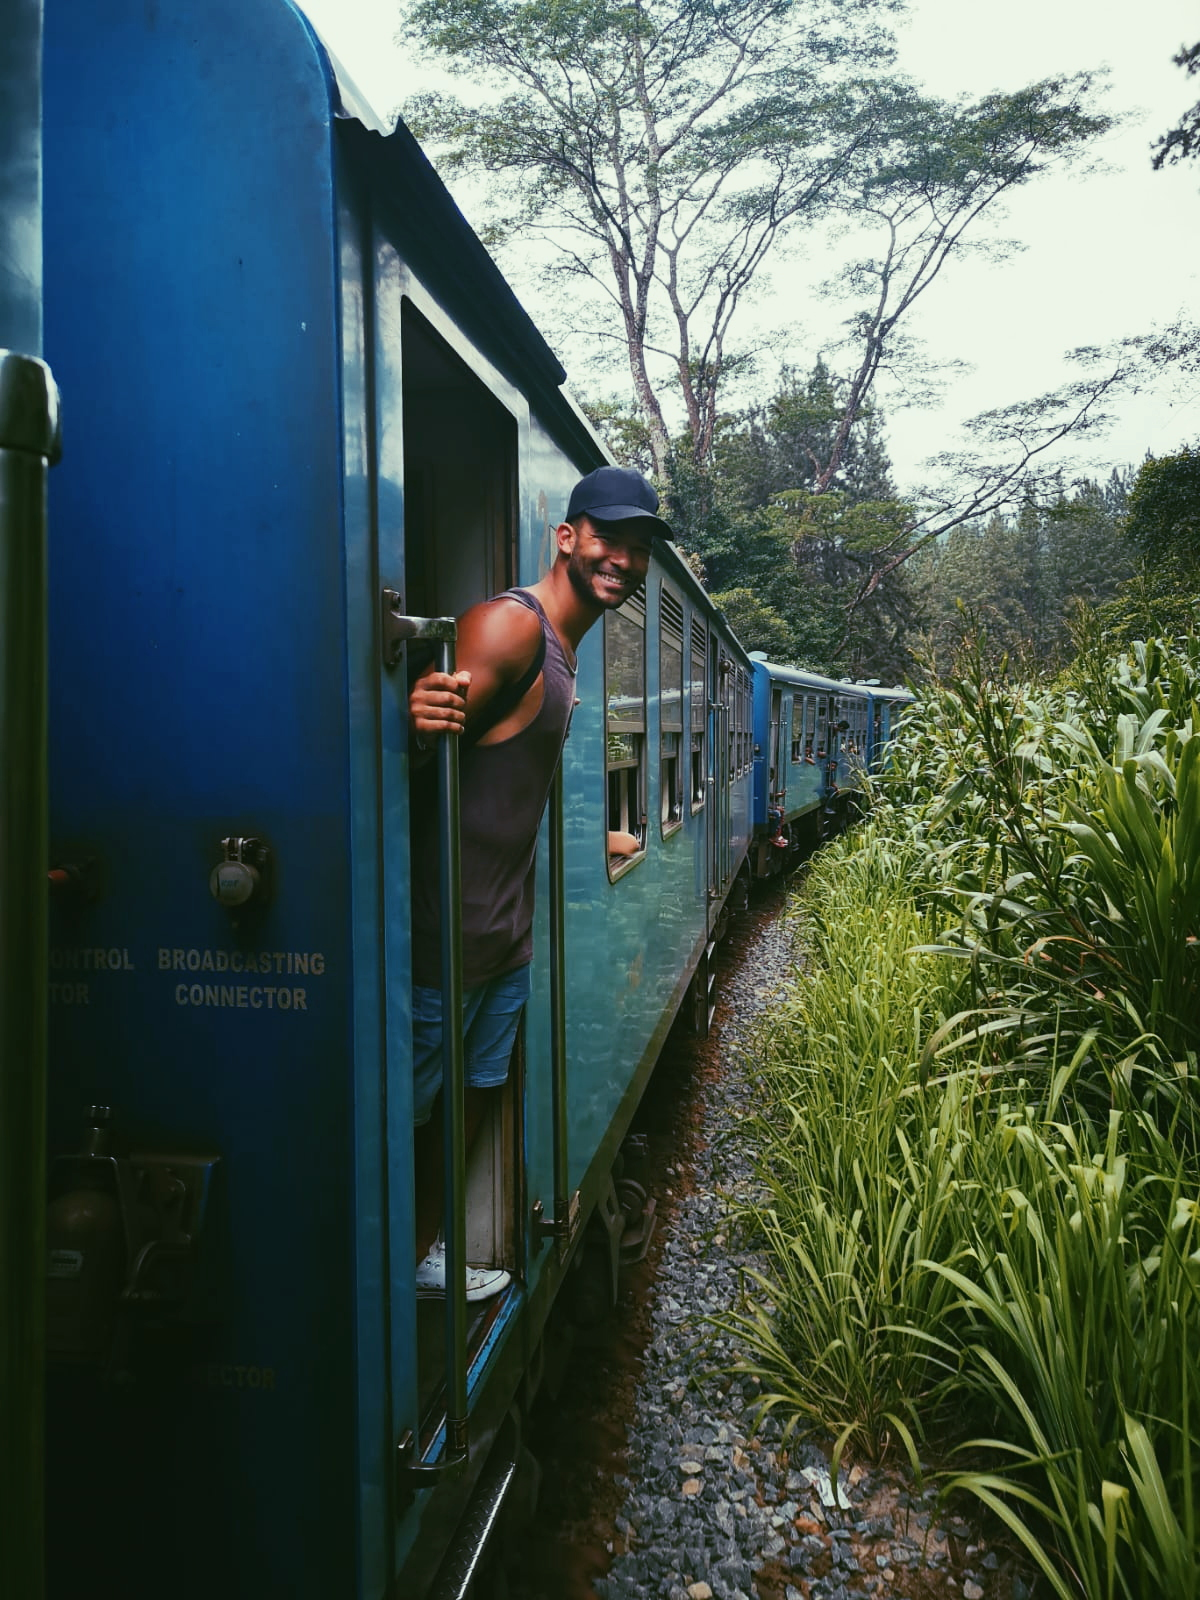 invite-to-paradise-sri-lanka-holiday-honeymoon-specialists-customer-feedback-elin-jordan-luce-train-door-lean.JPG